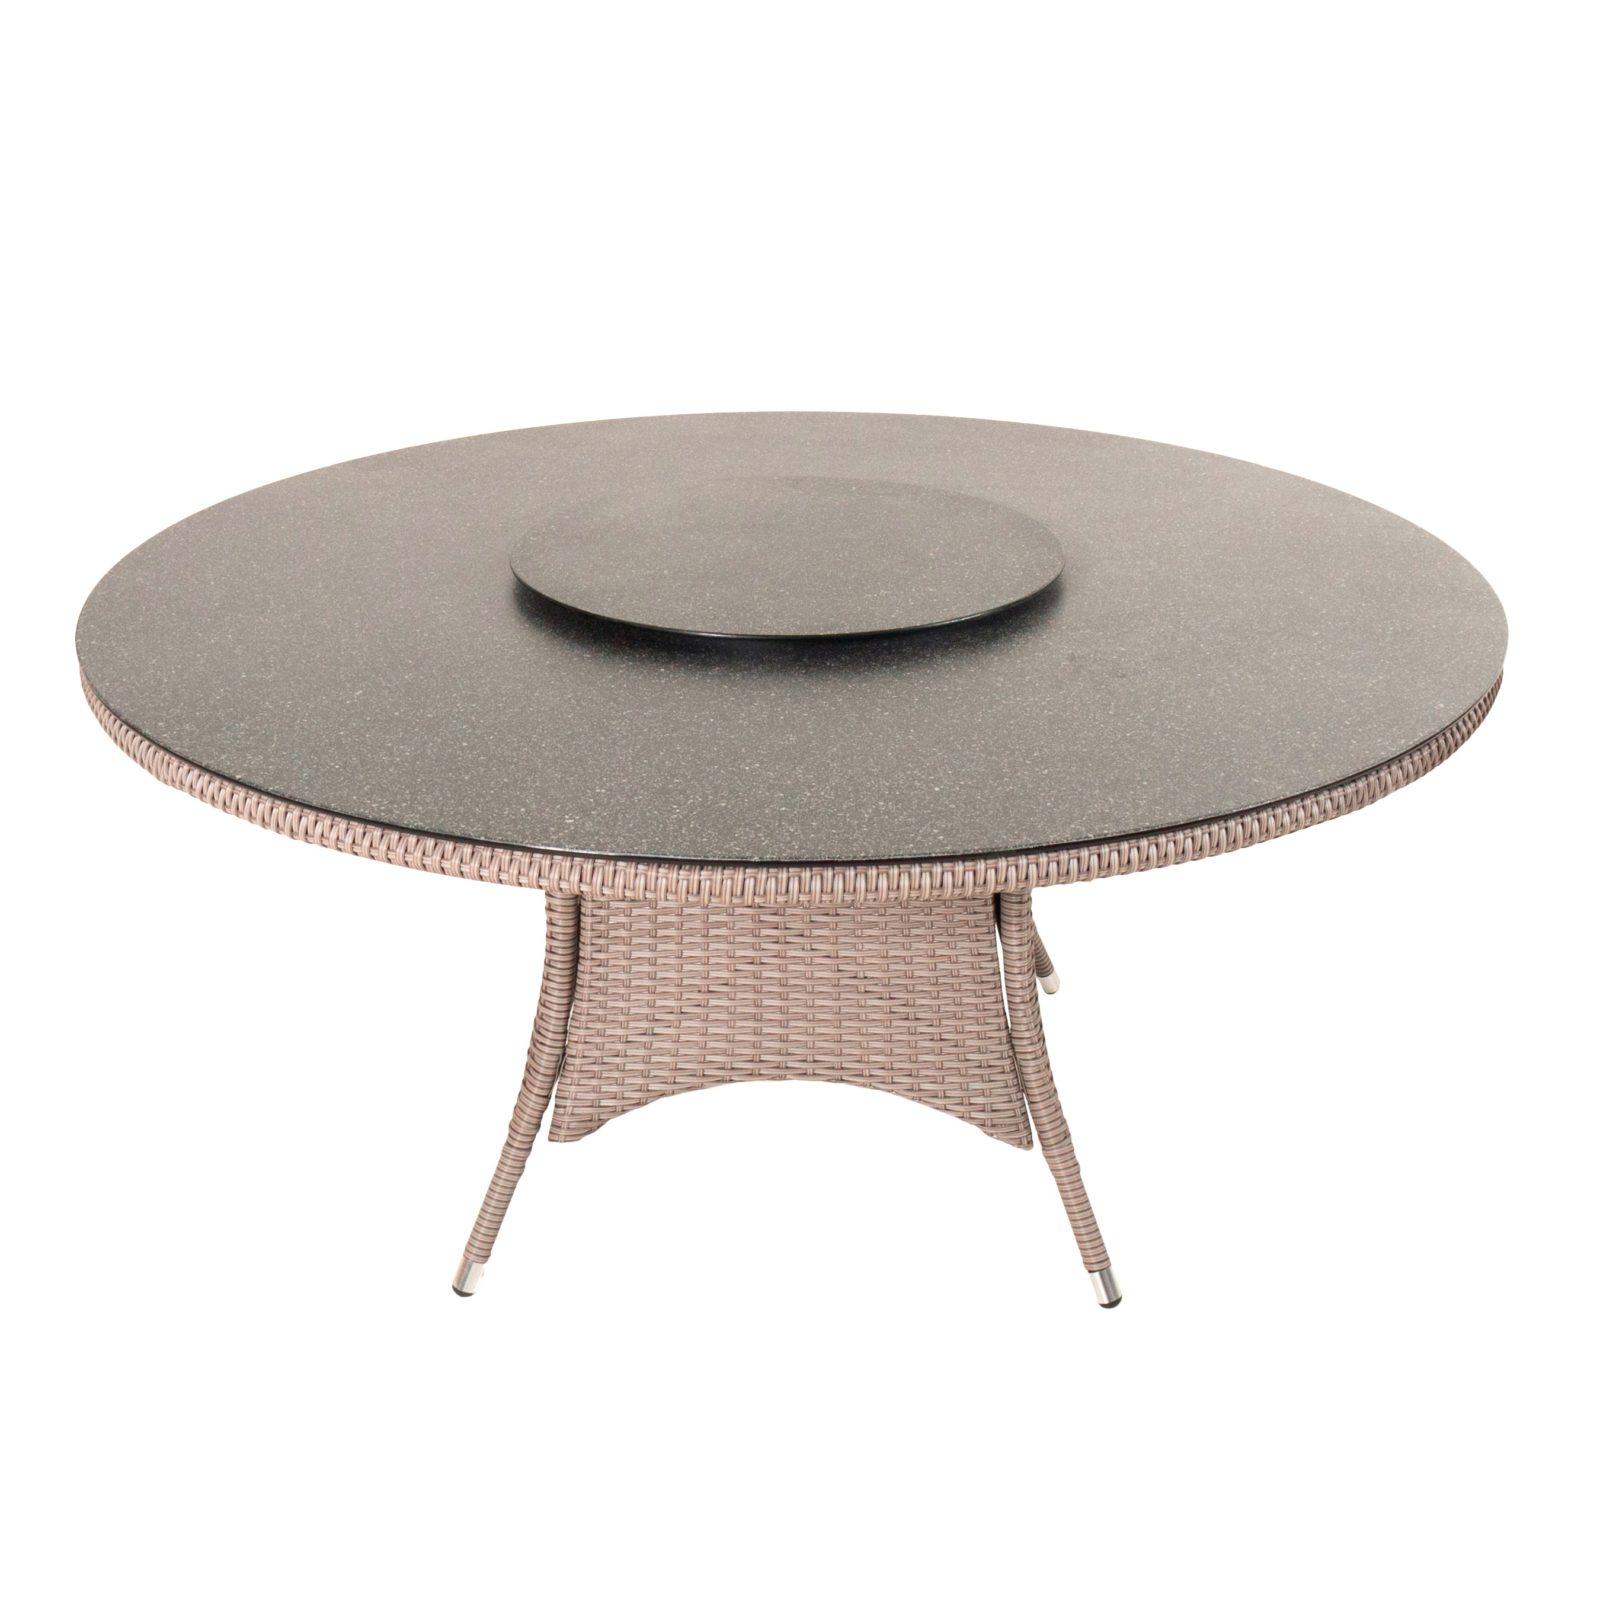 Kansas rundt spisebord Ø150 cm med spraystone glas bordplade i natur 21249